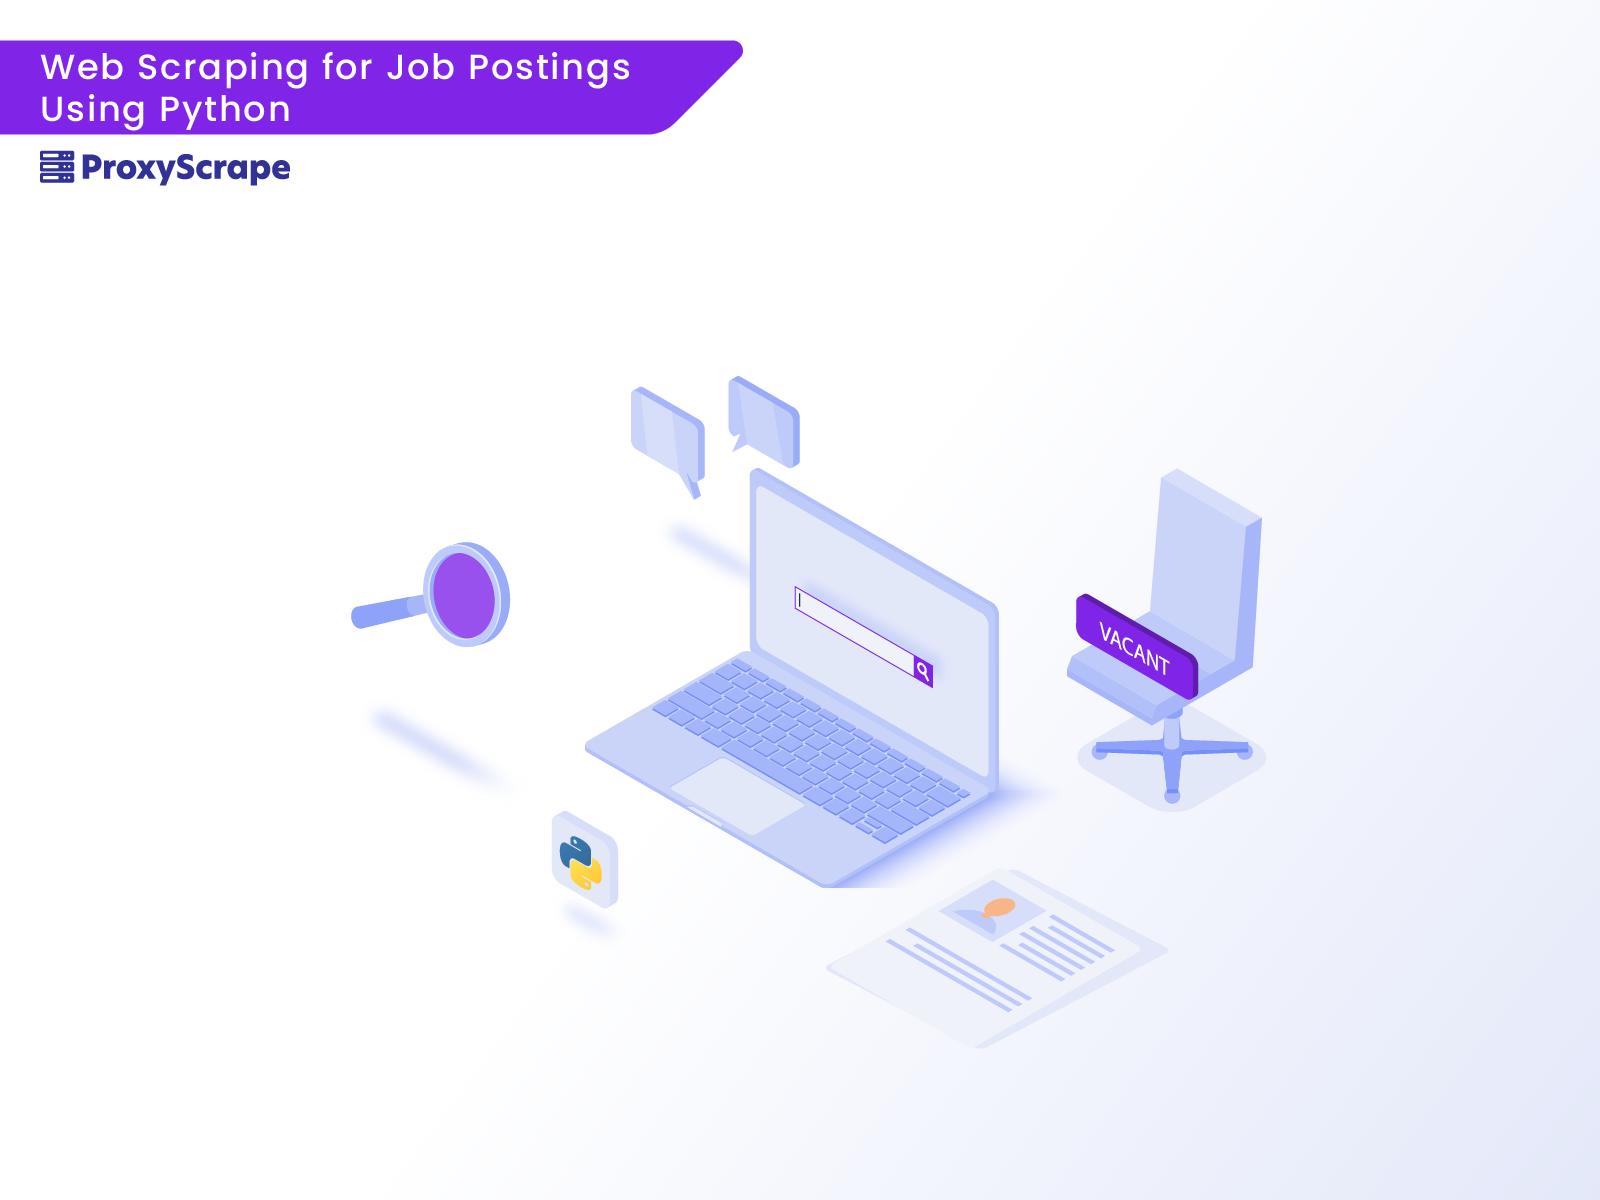 Web Scraping for Job Postings Using Python